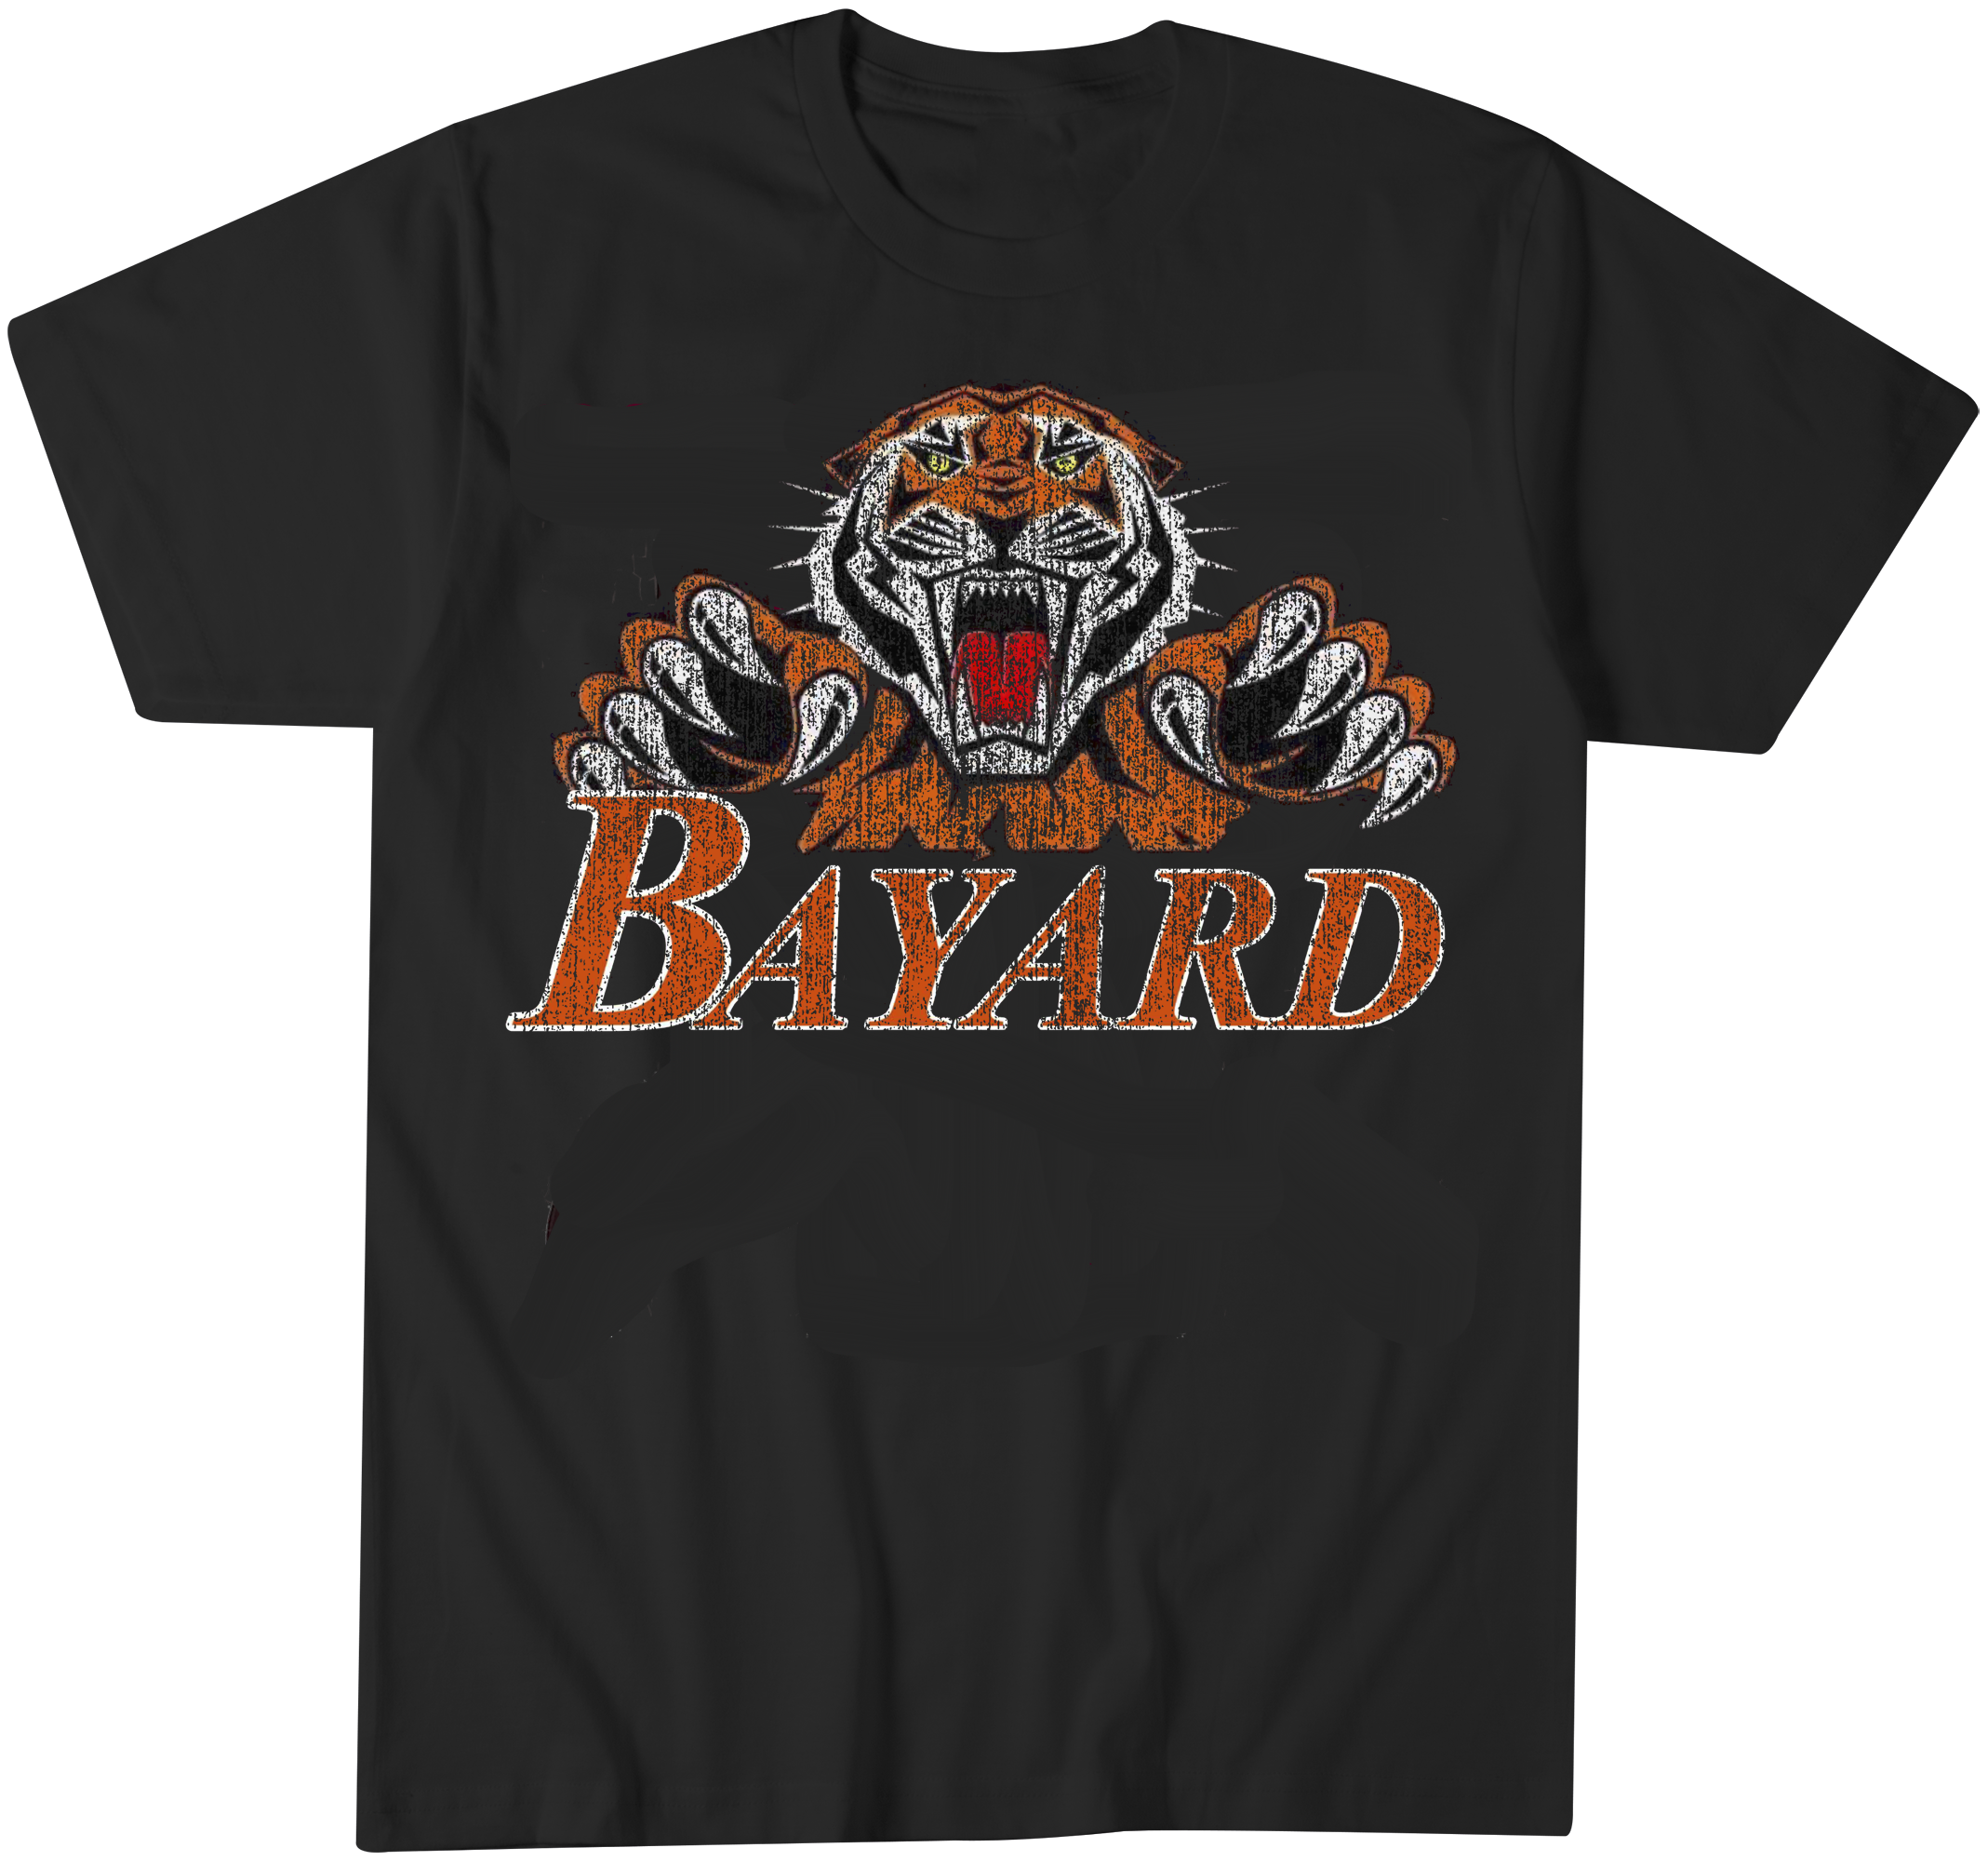 Bayard T-shirt.png